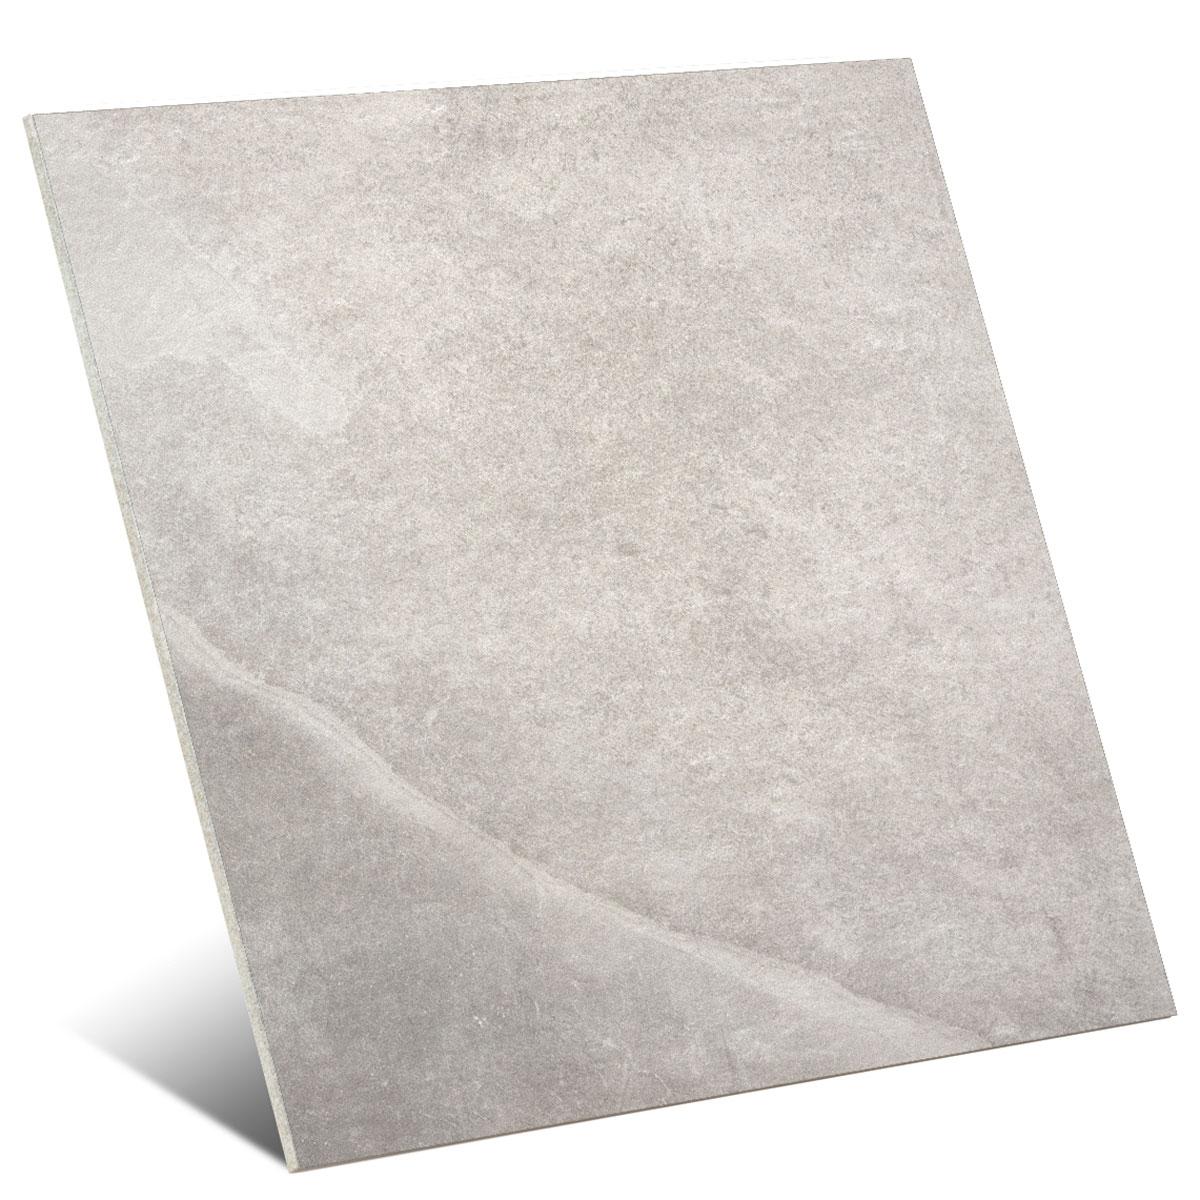 Maverick Gris 60x60 20mm (caja 0.70 m2)